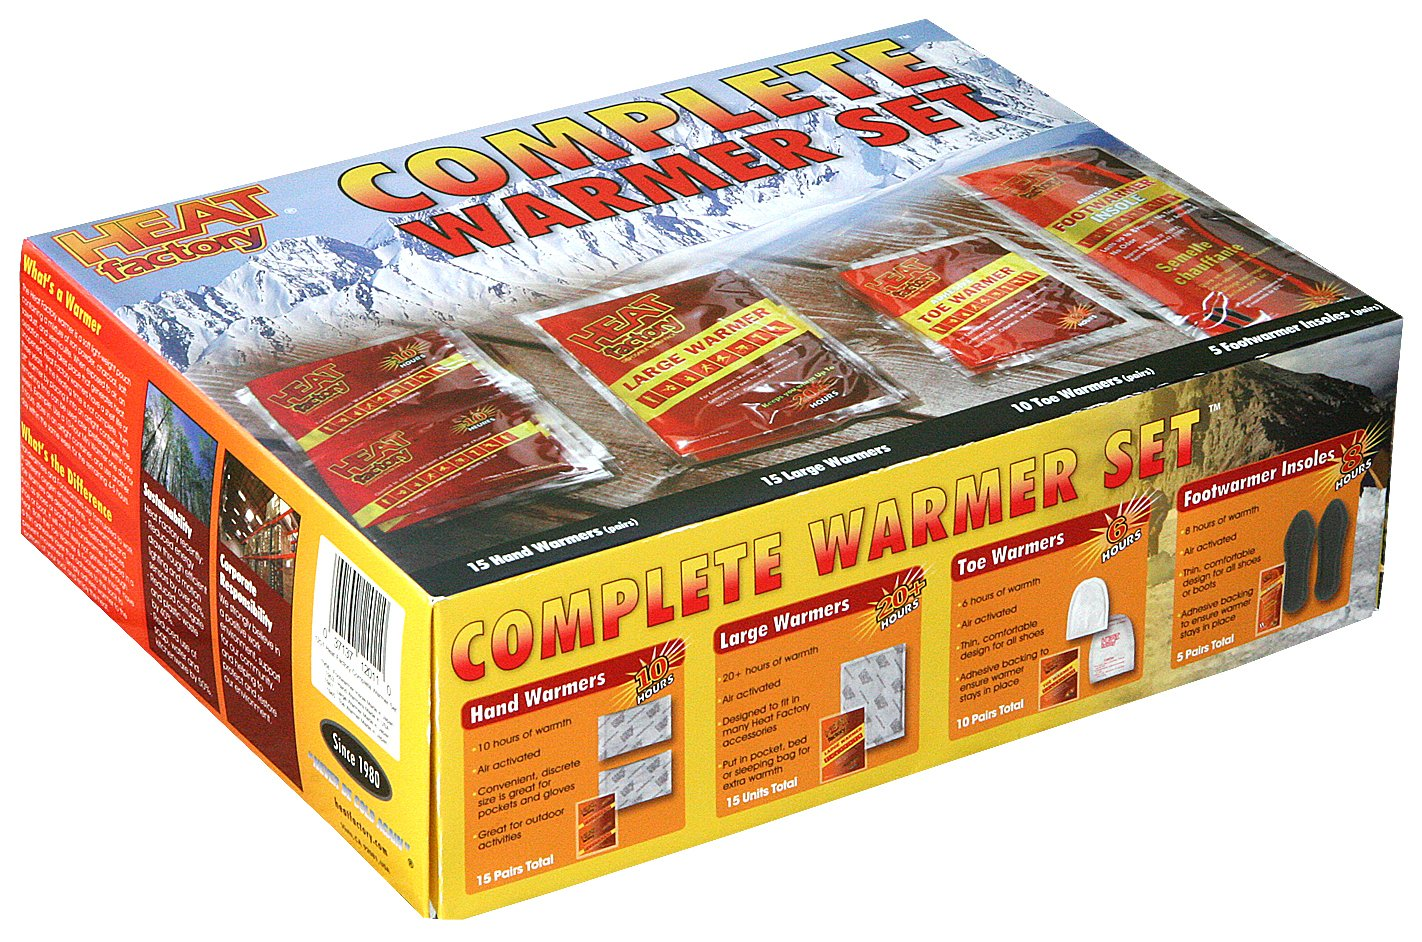 Complete Warmer Set B003Y79IJ0